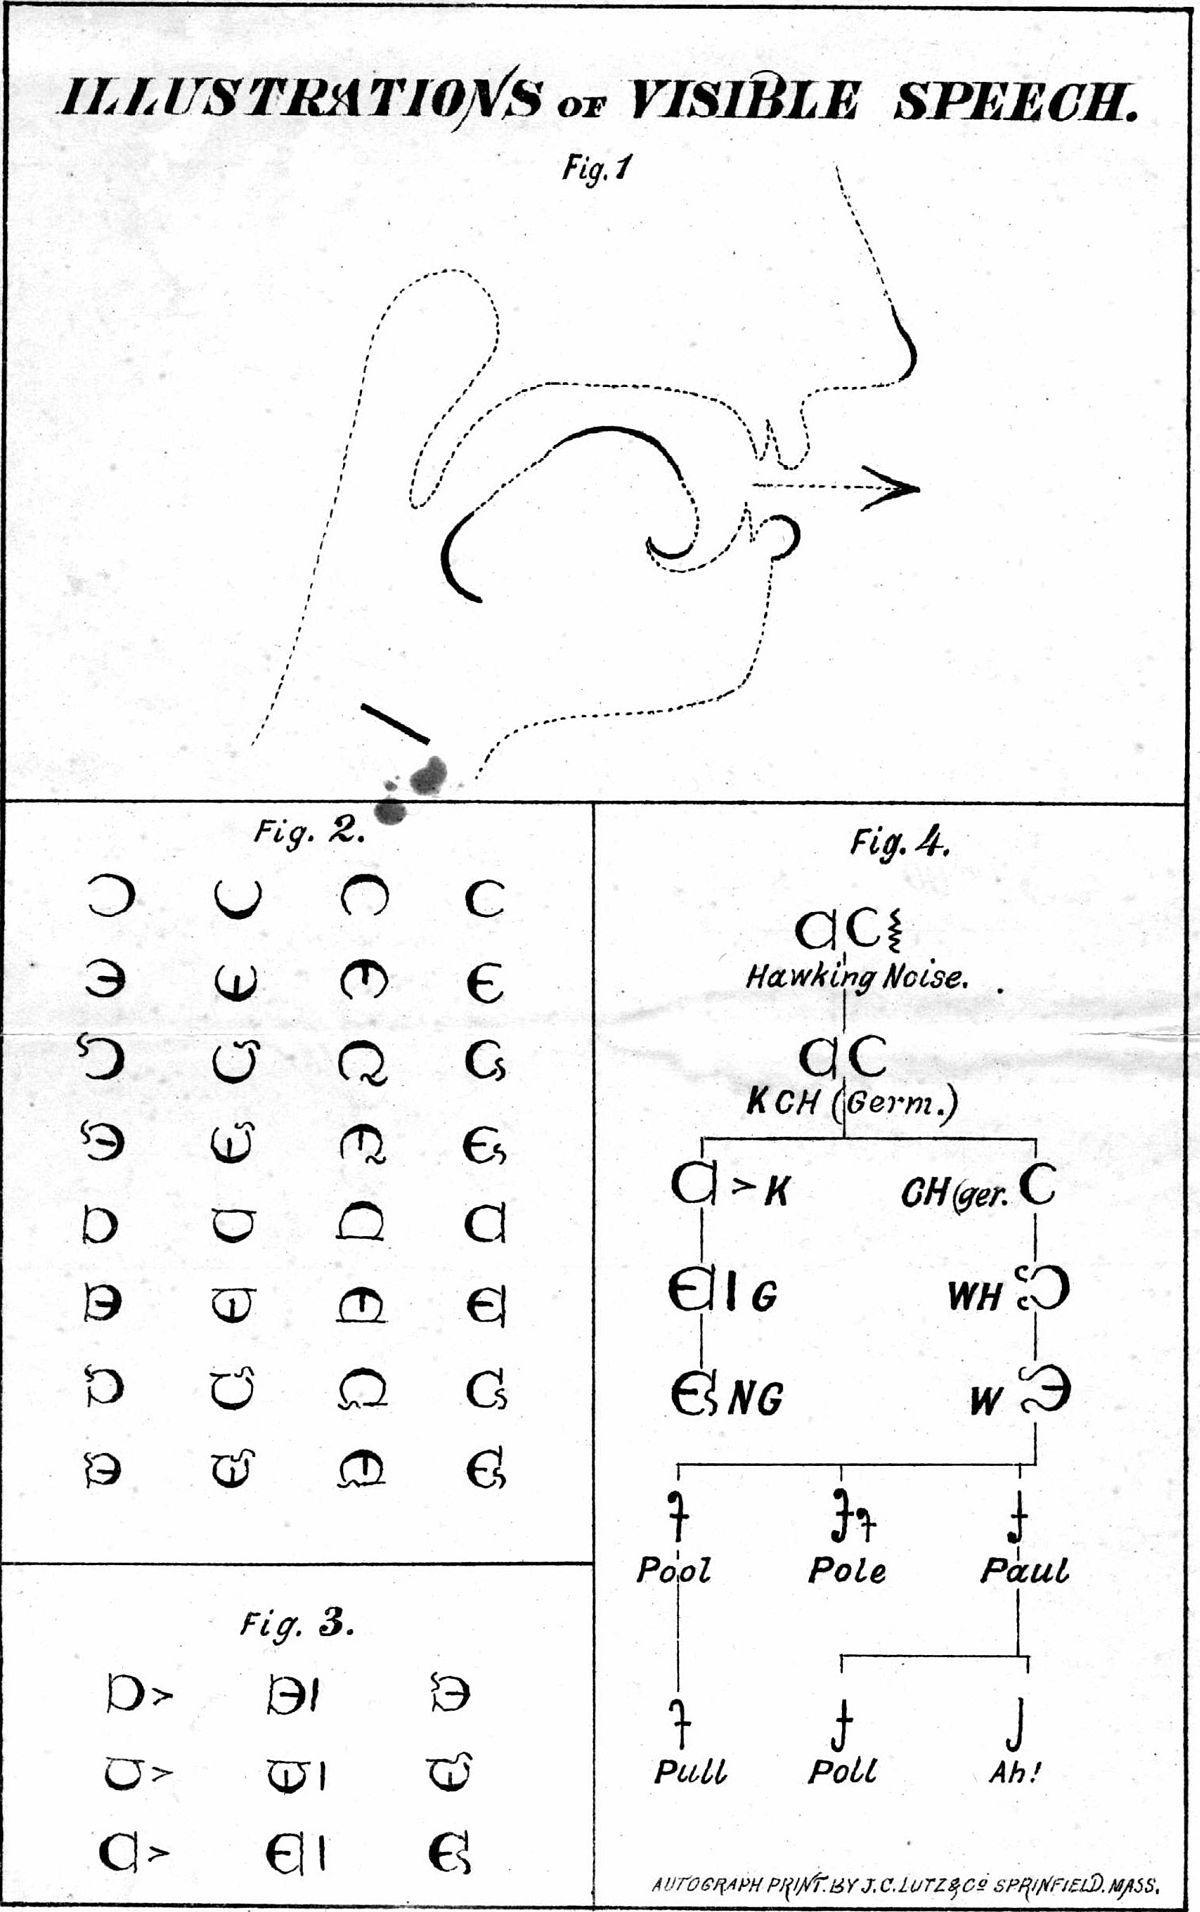 Visible Speech Wikipedia